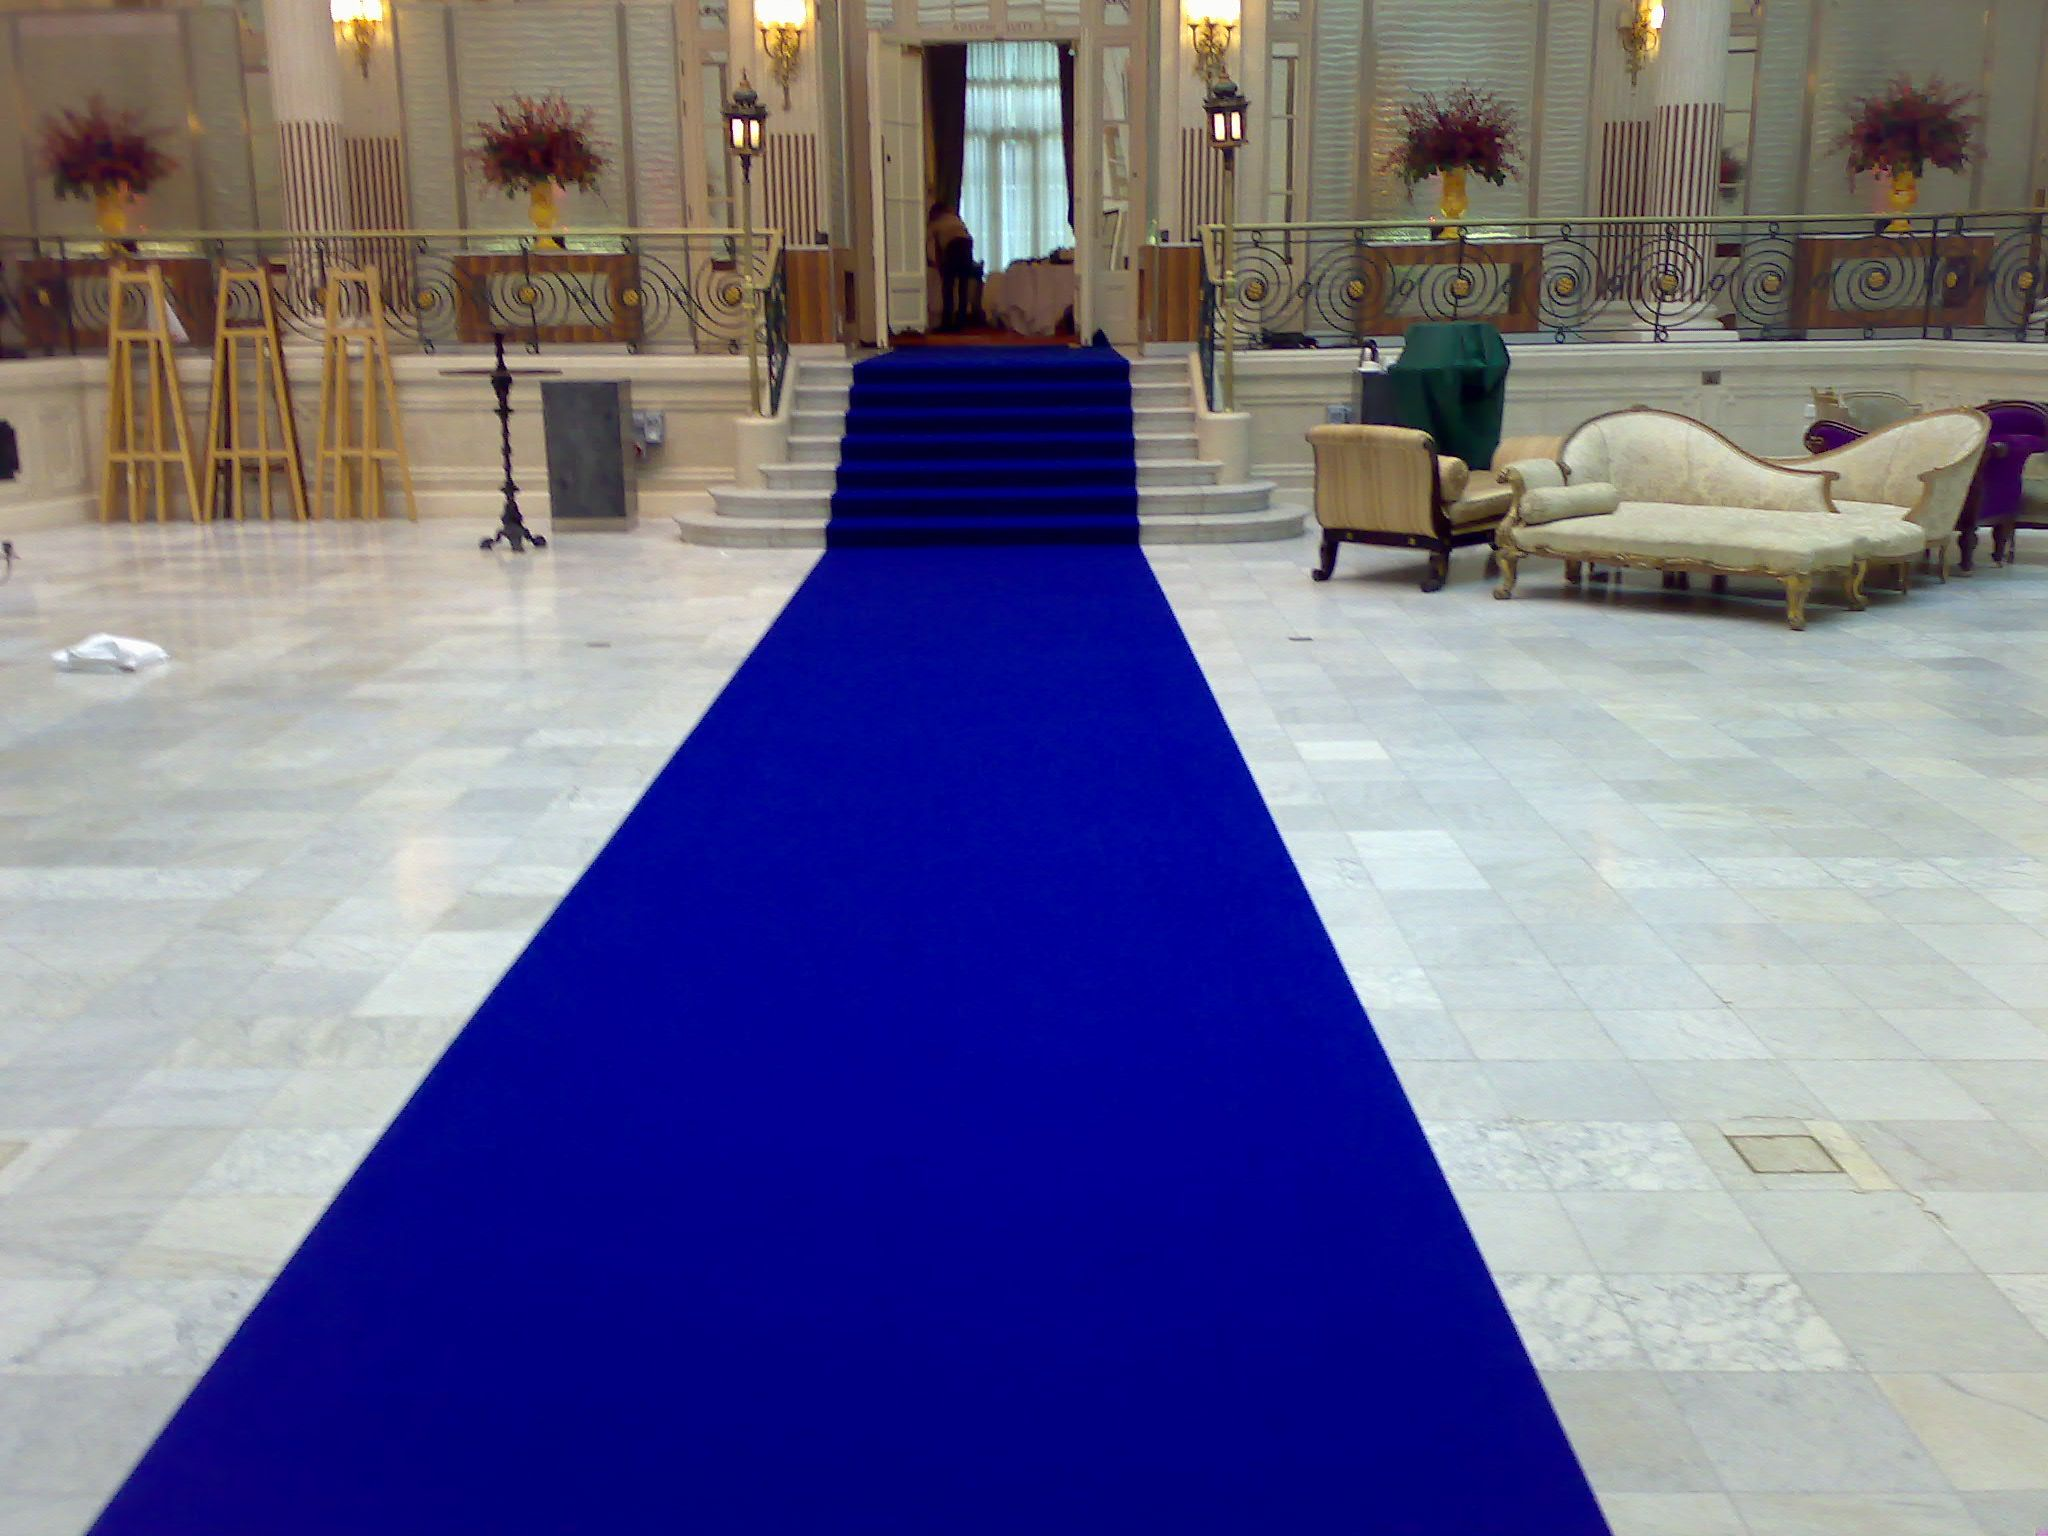 Pin By Patrick Hallowell On Blue Blue Carpet Aisle Runner